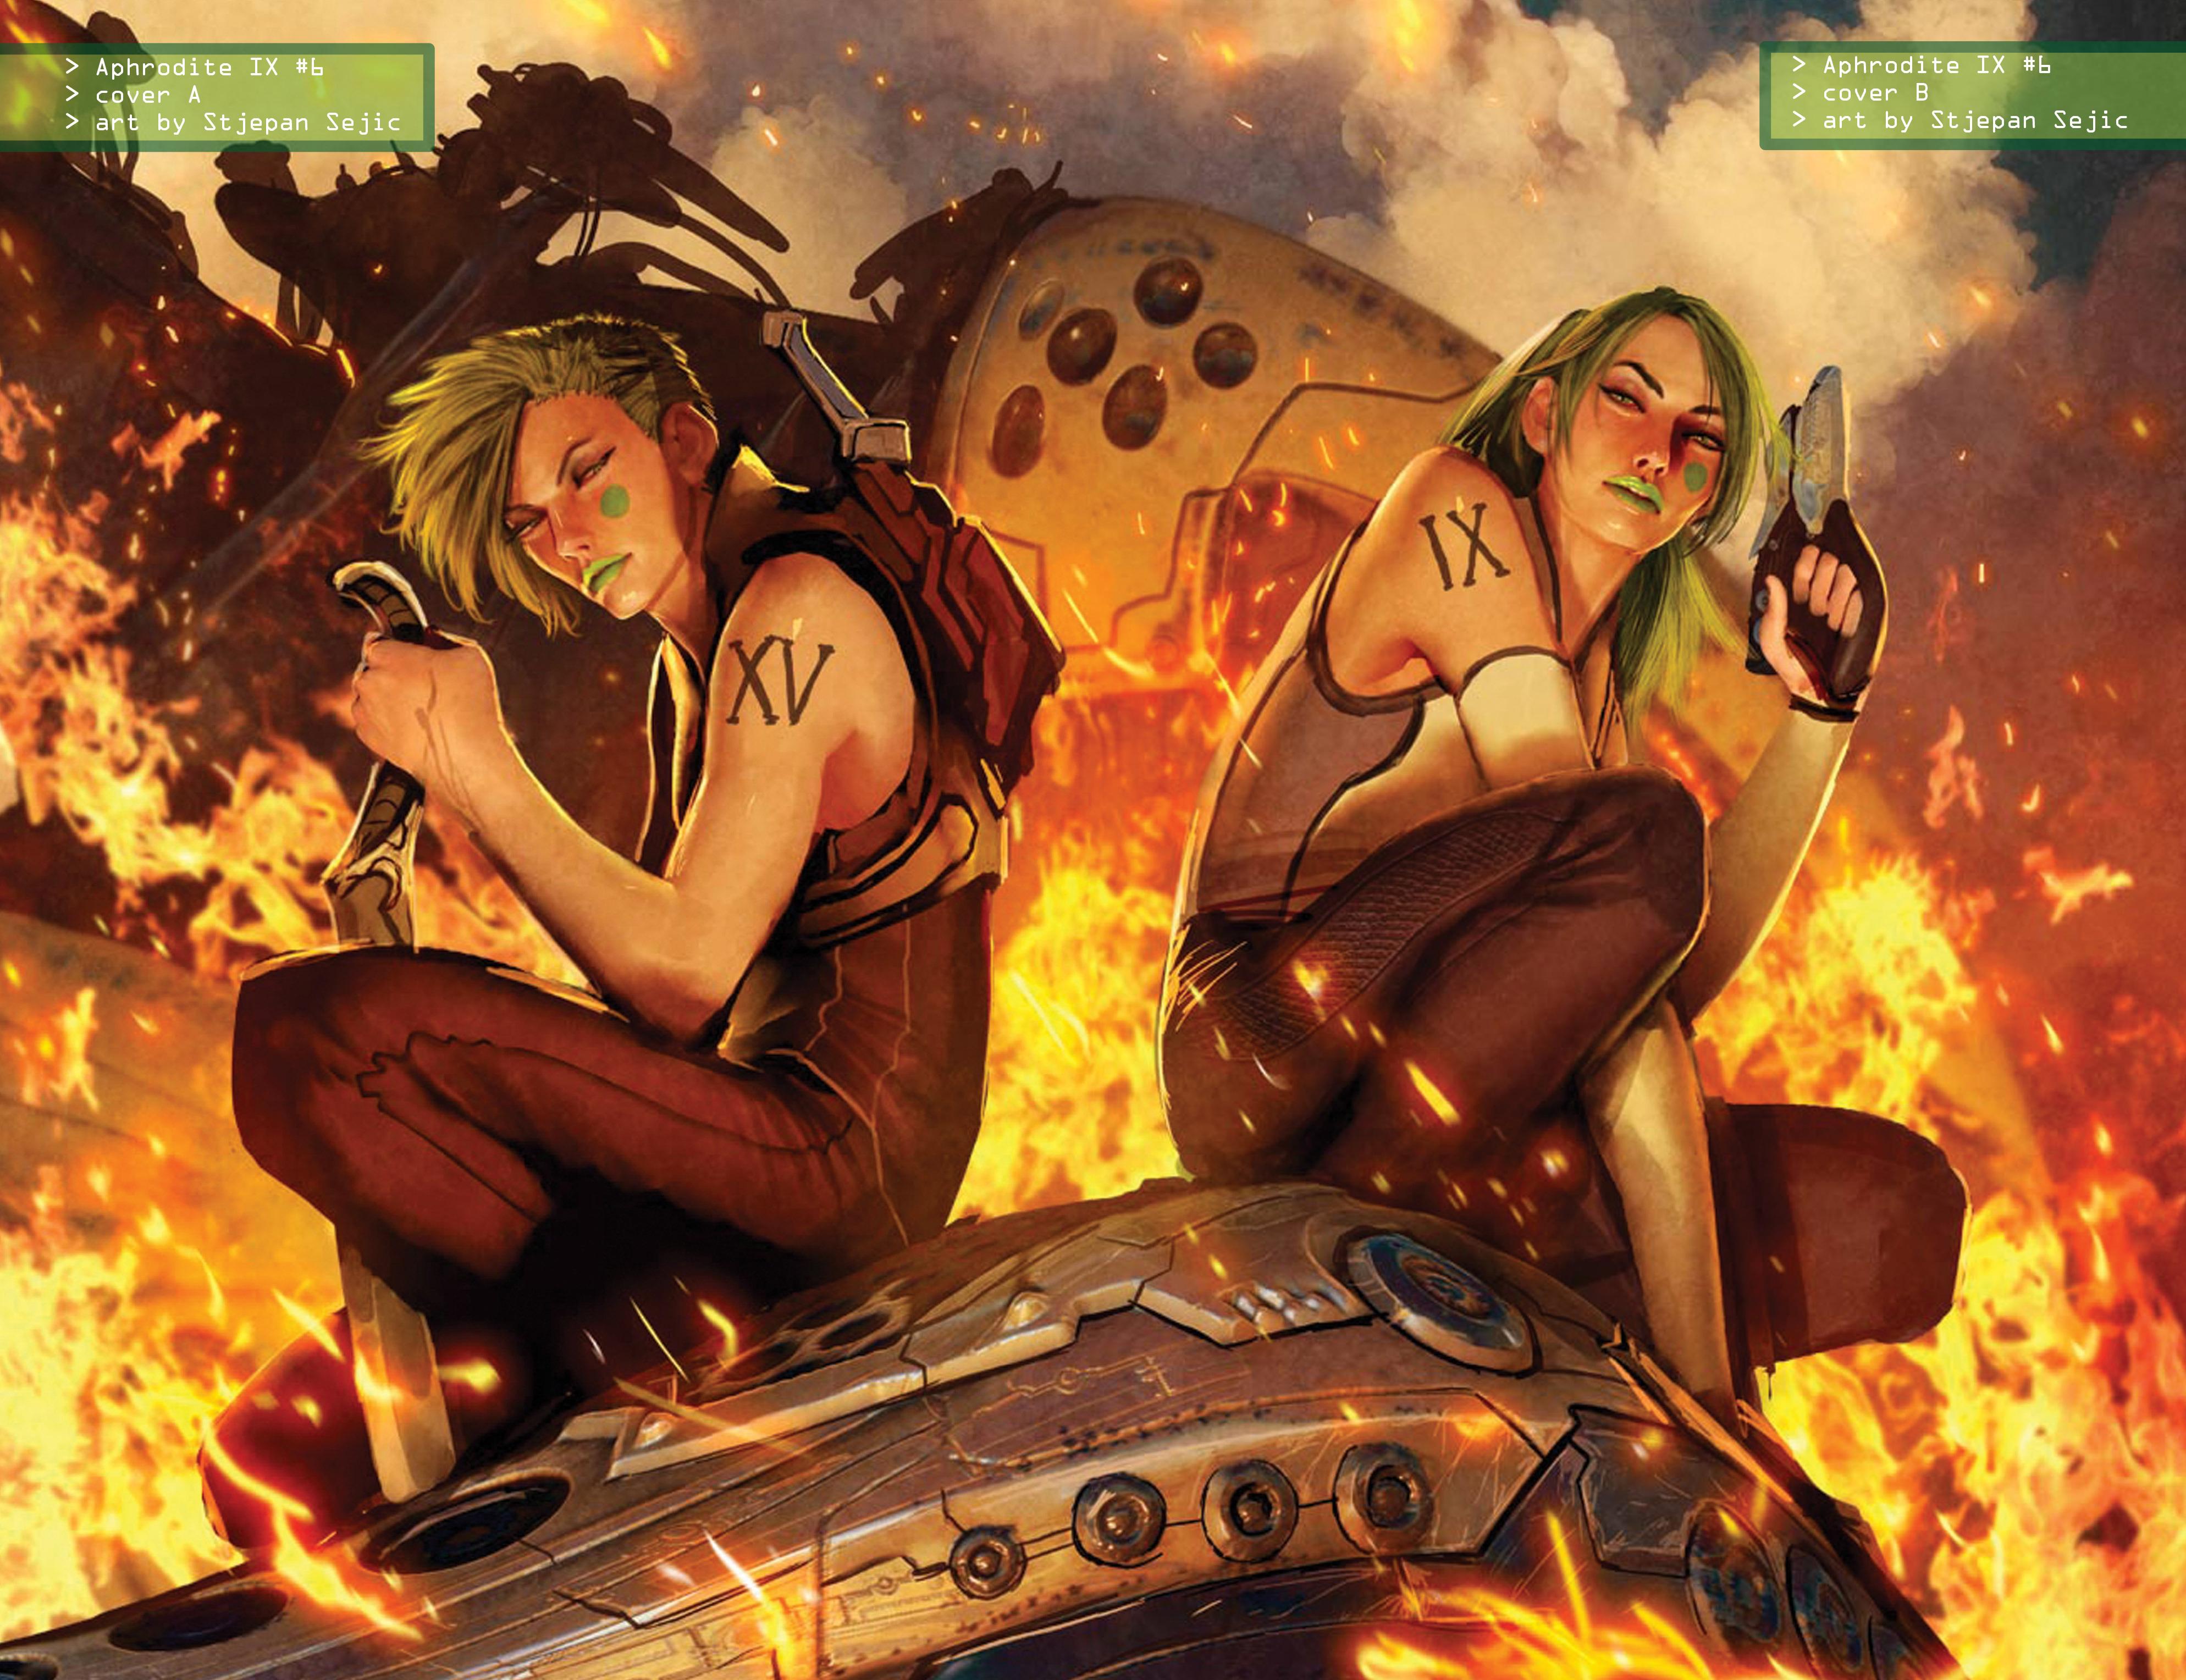 Read online Aphrodite IX (2013) comic -  Issue #Aphrodite IX (2013) _TPB 2 - 141